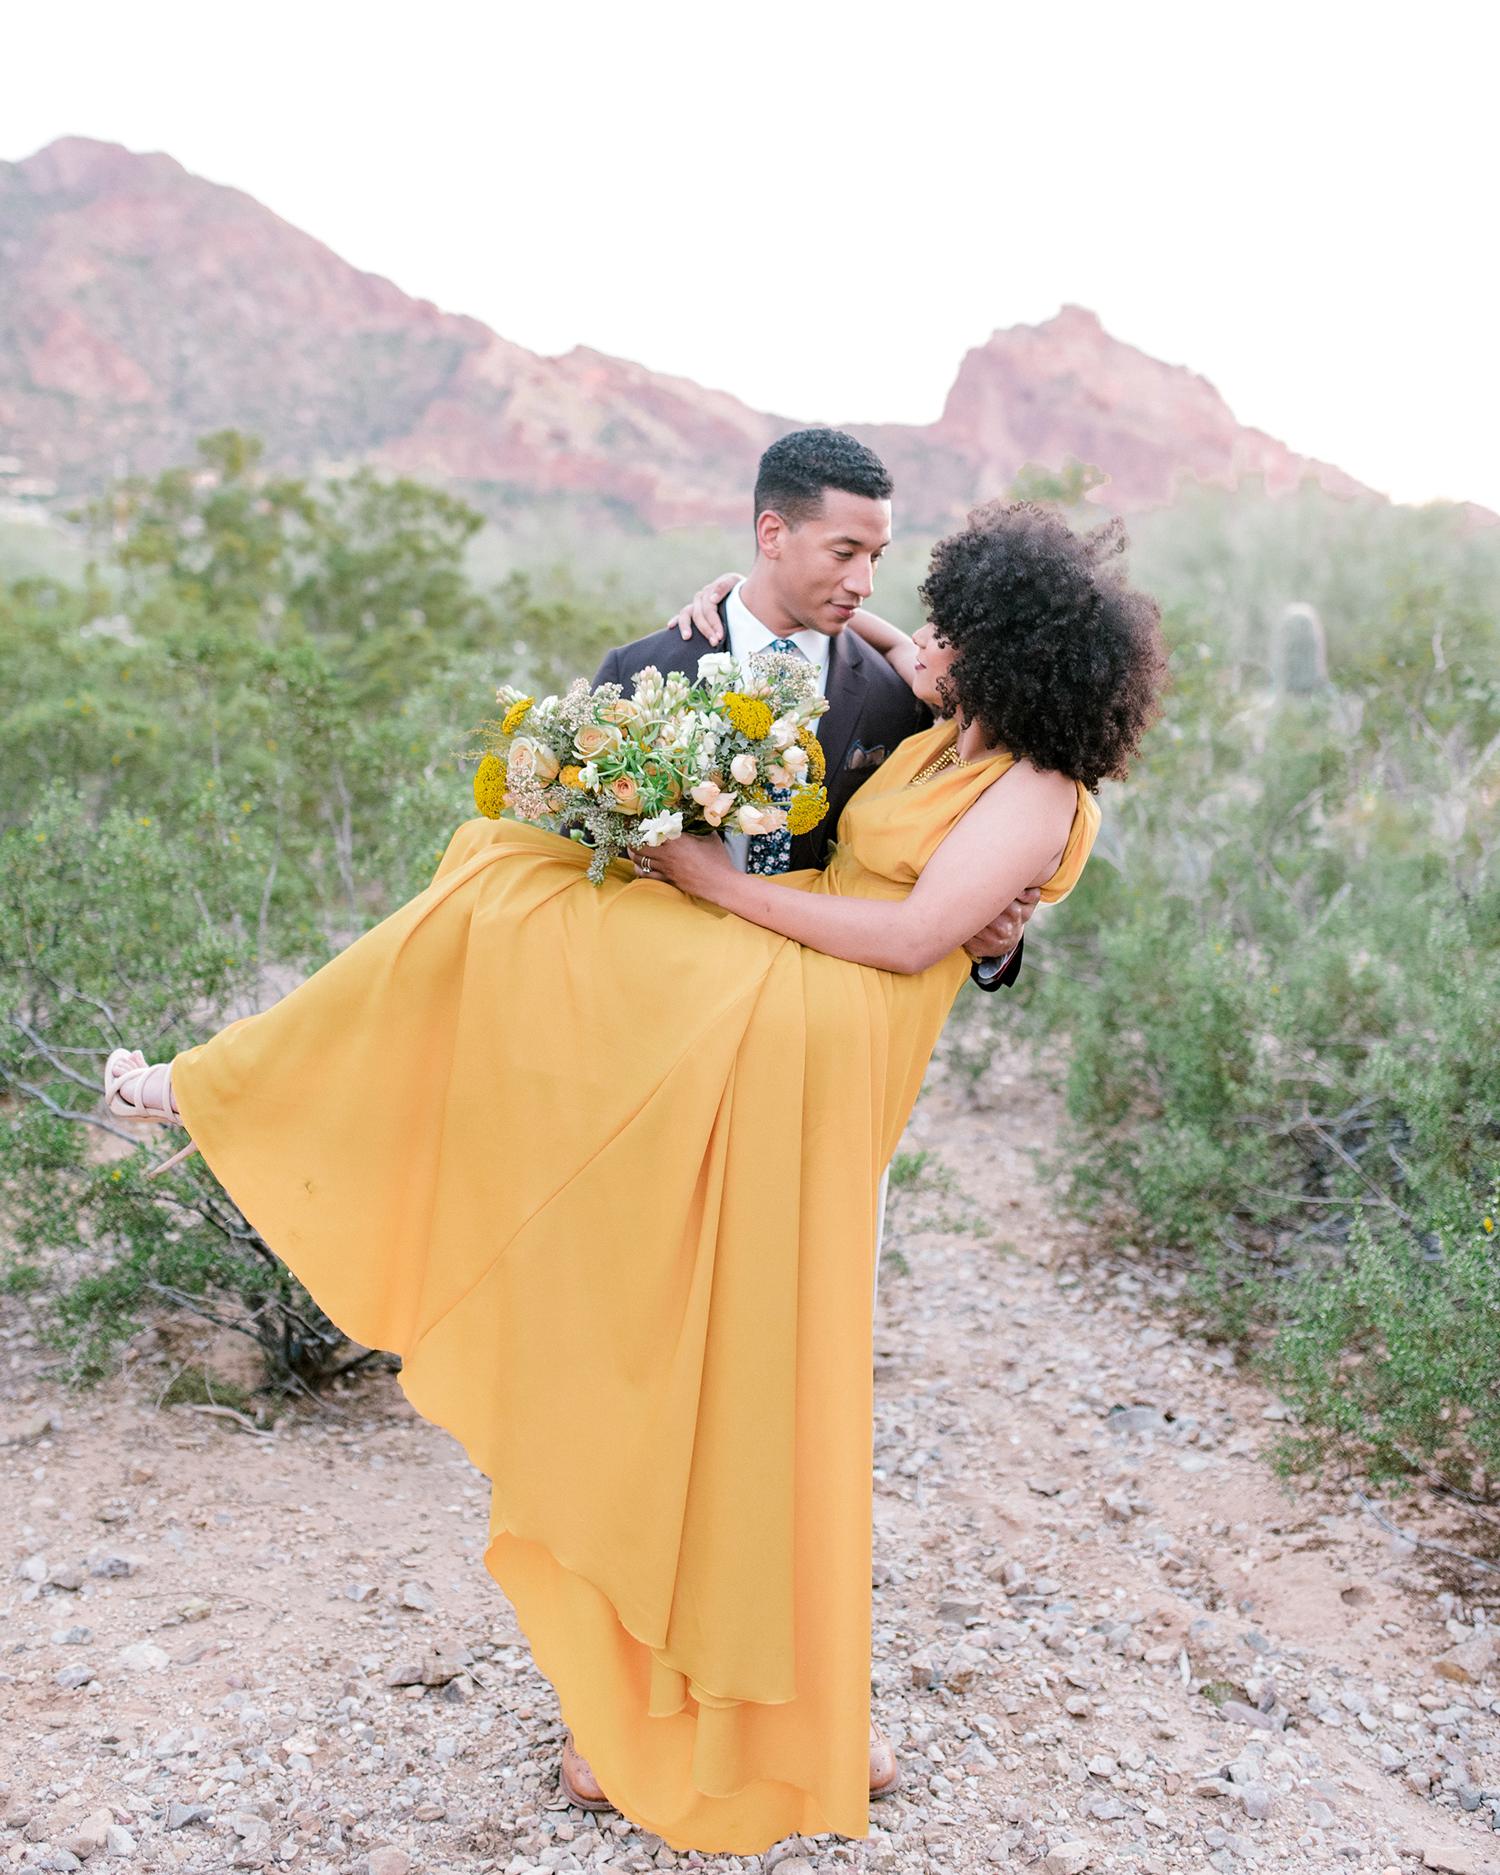 sunset wedding photos groom carrying bride in desert